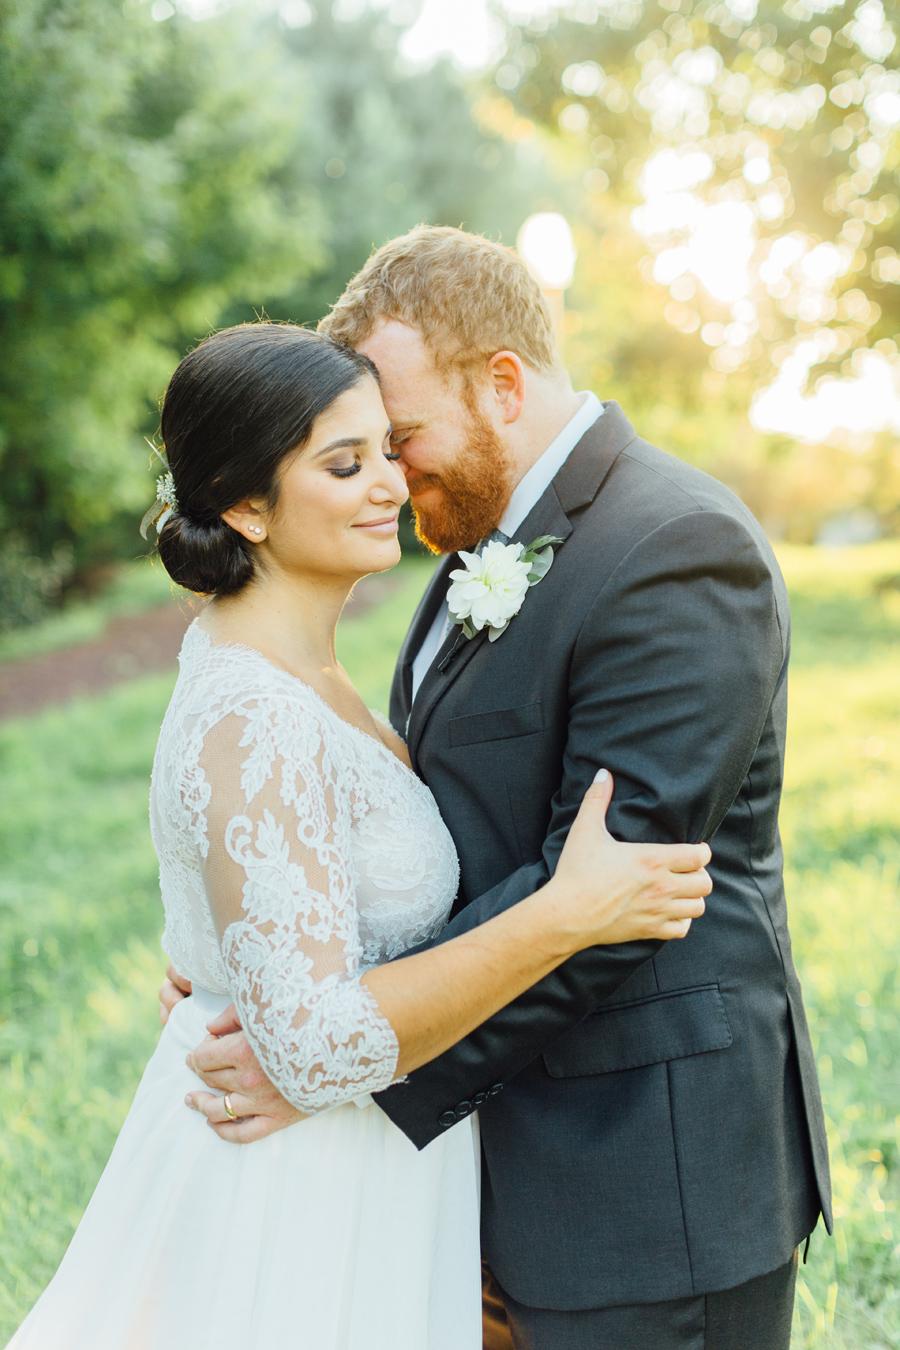 the-inn-at-leola-wedding-lancaster-pennsylvania-wedding-photographer-rebeka-viola-photograhy (78).jpg